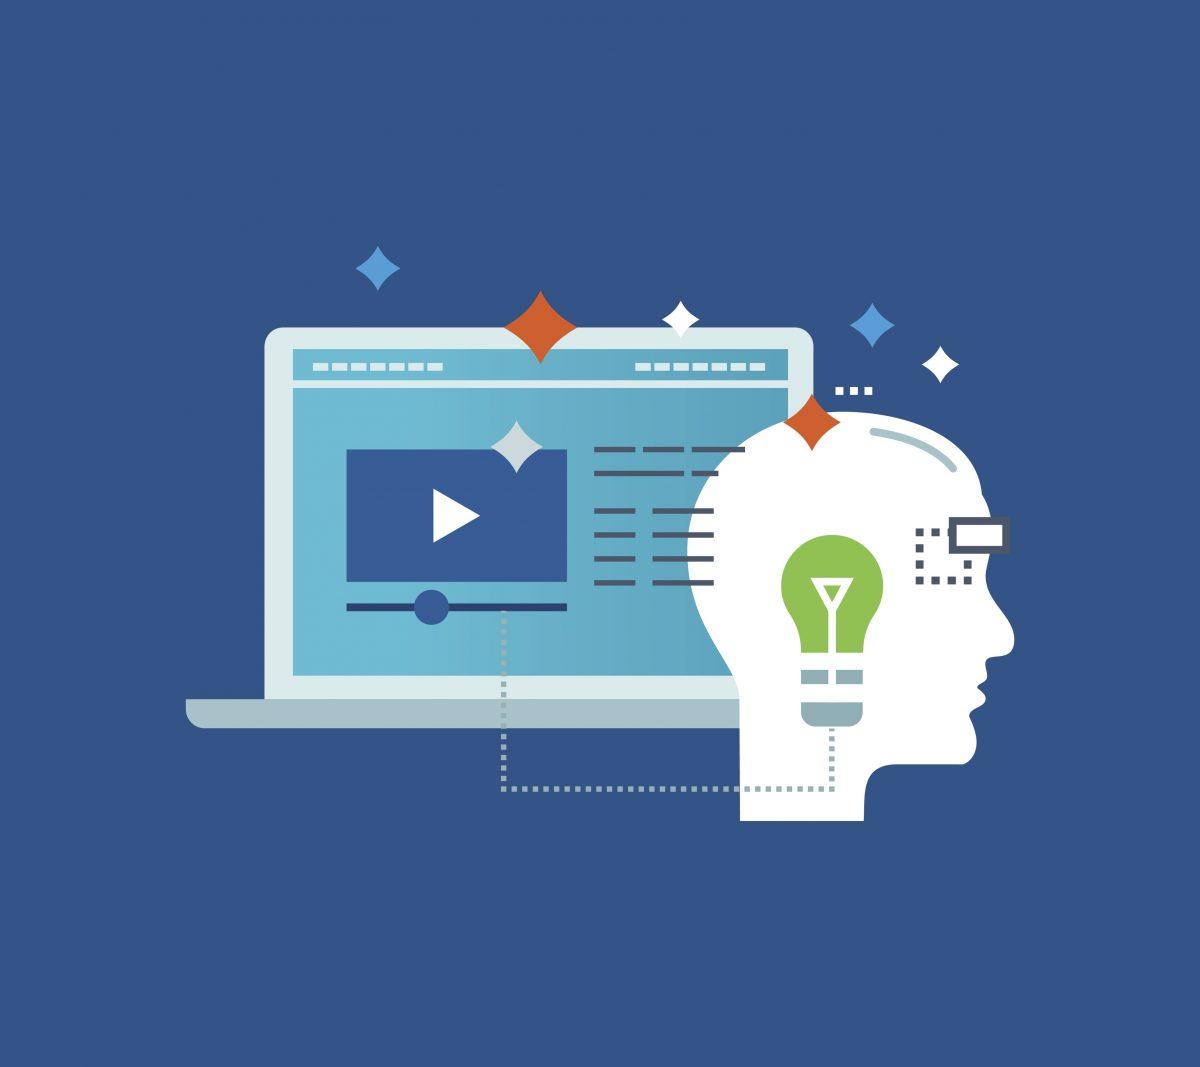 Vilynx Intel Video Engagement Demo